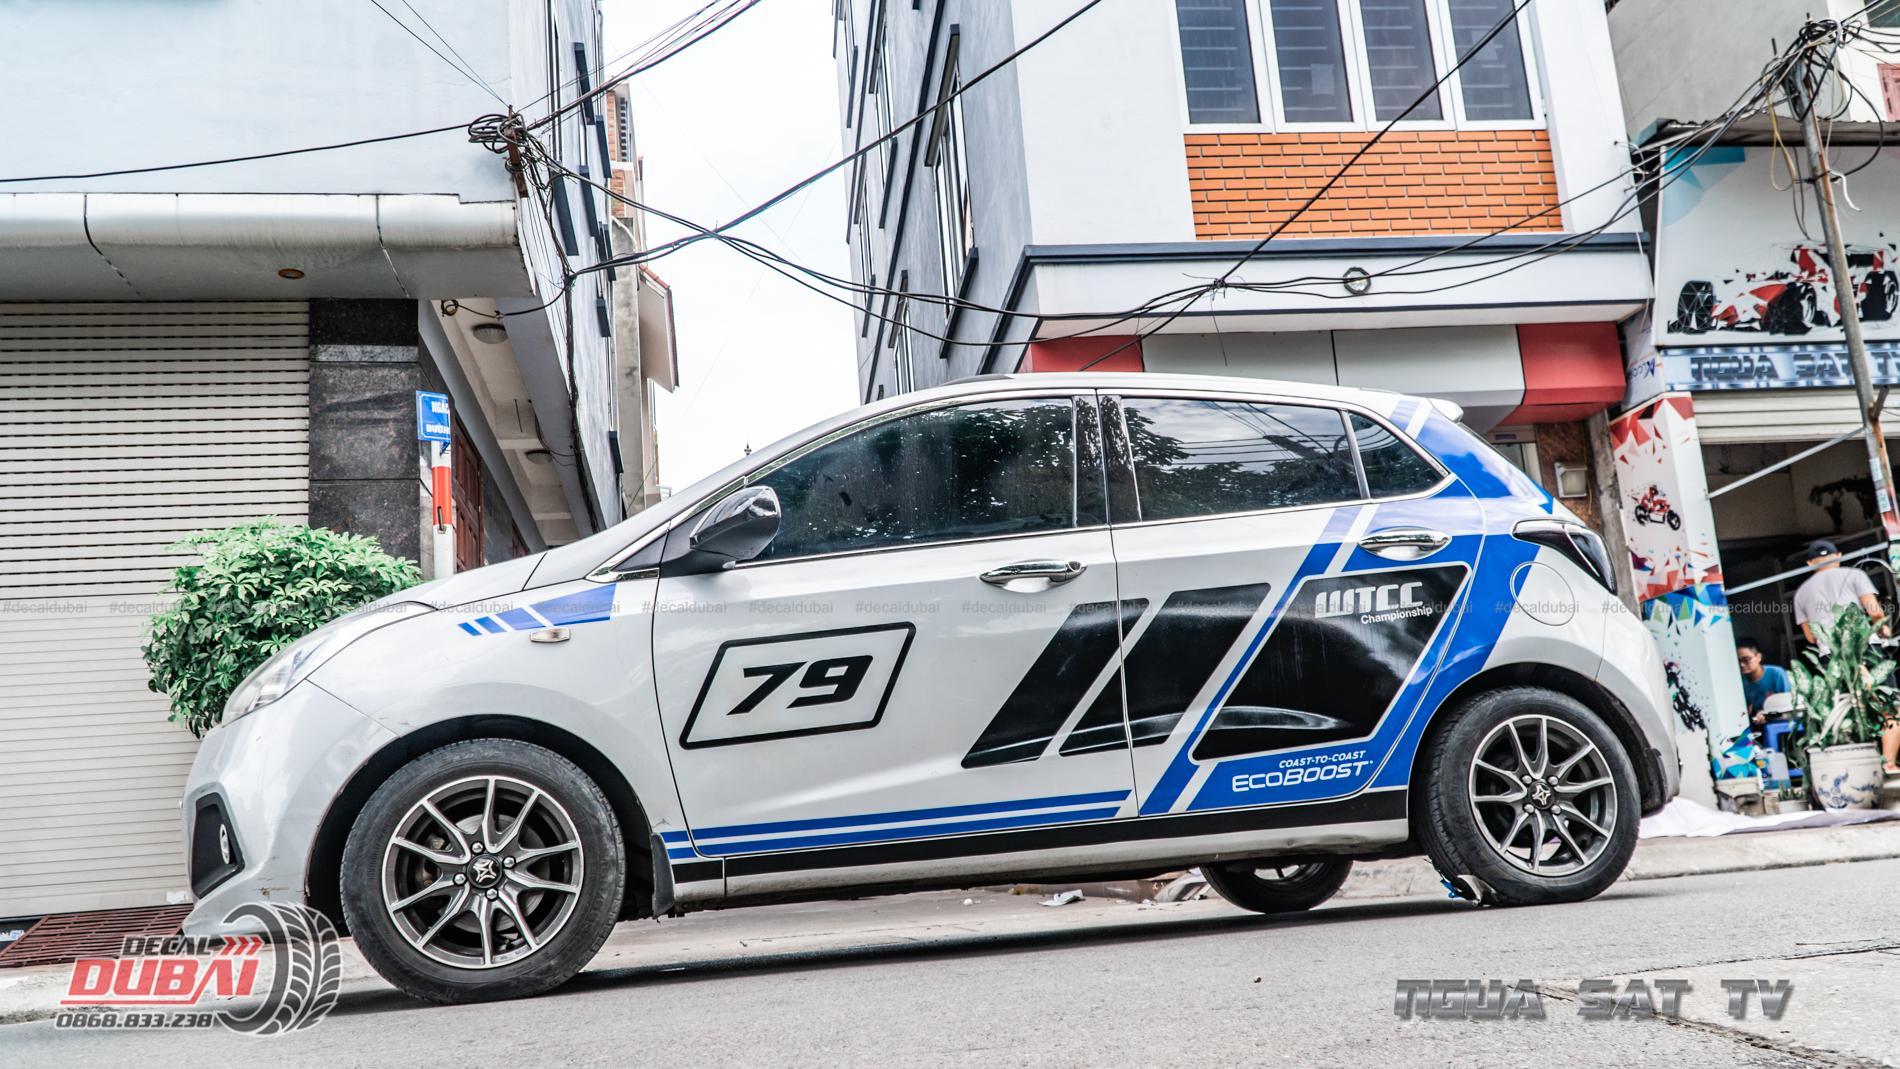 Tem-dan-Xe-i10-01-do-phong-cach-the-thao